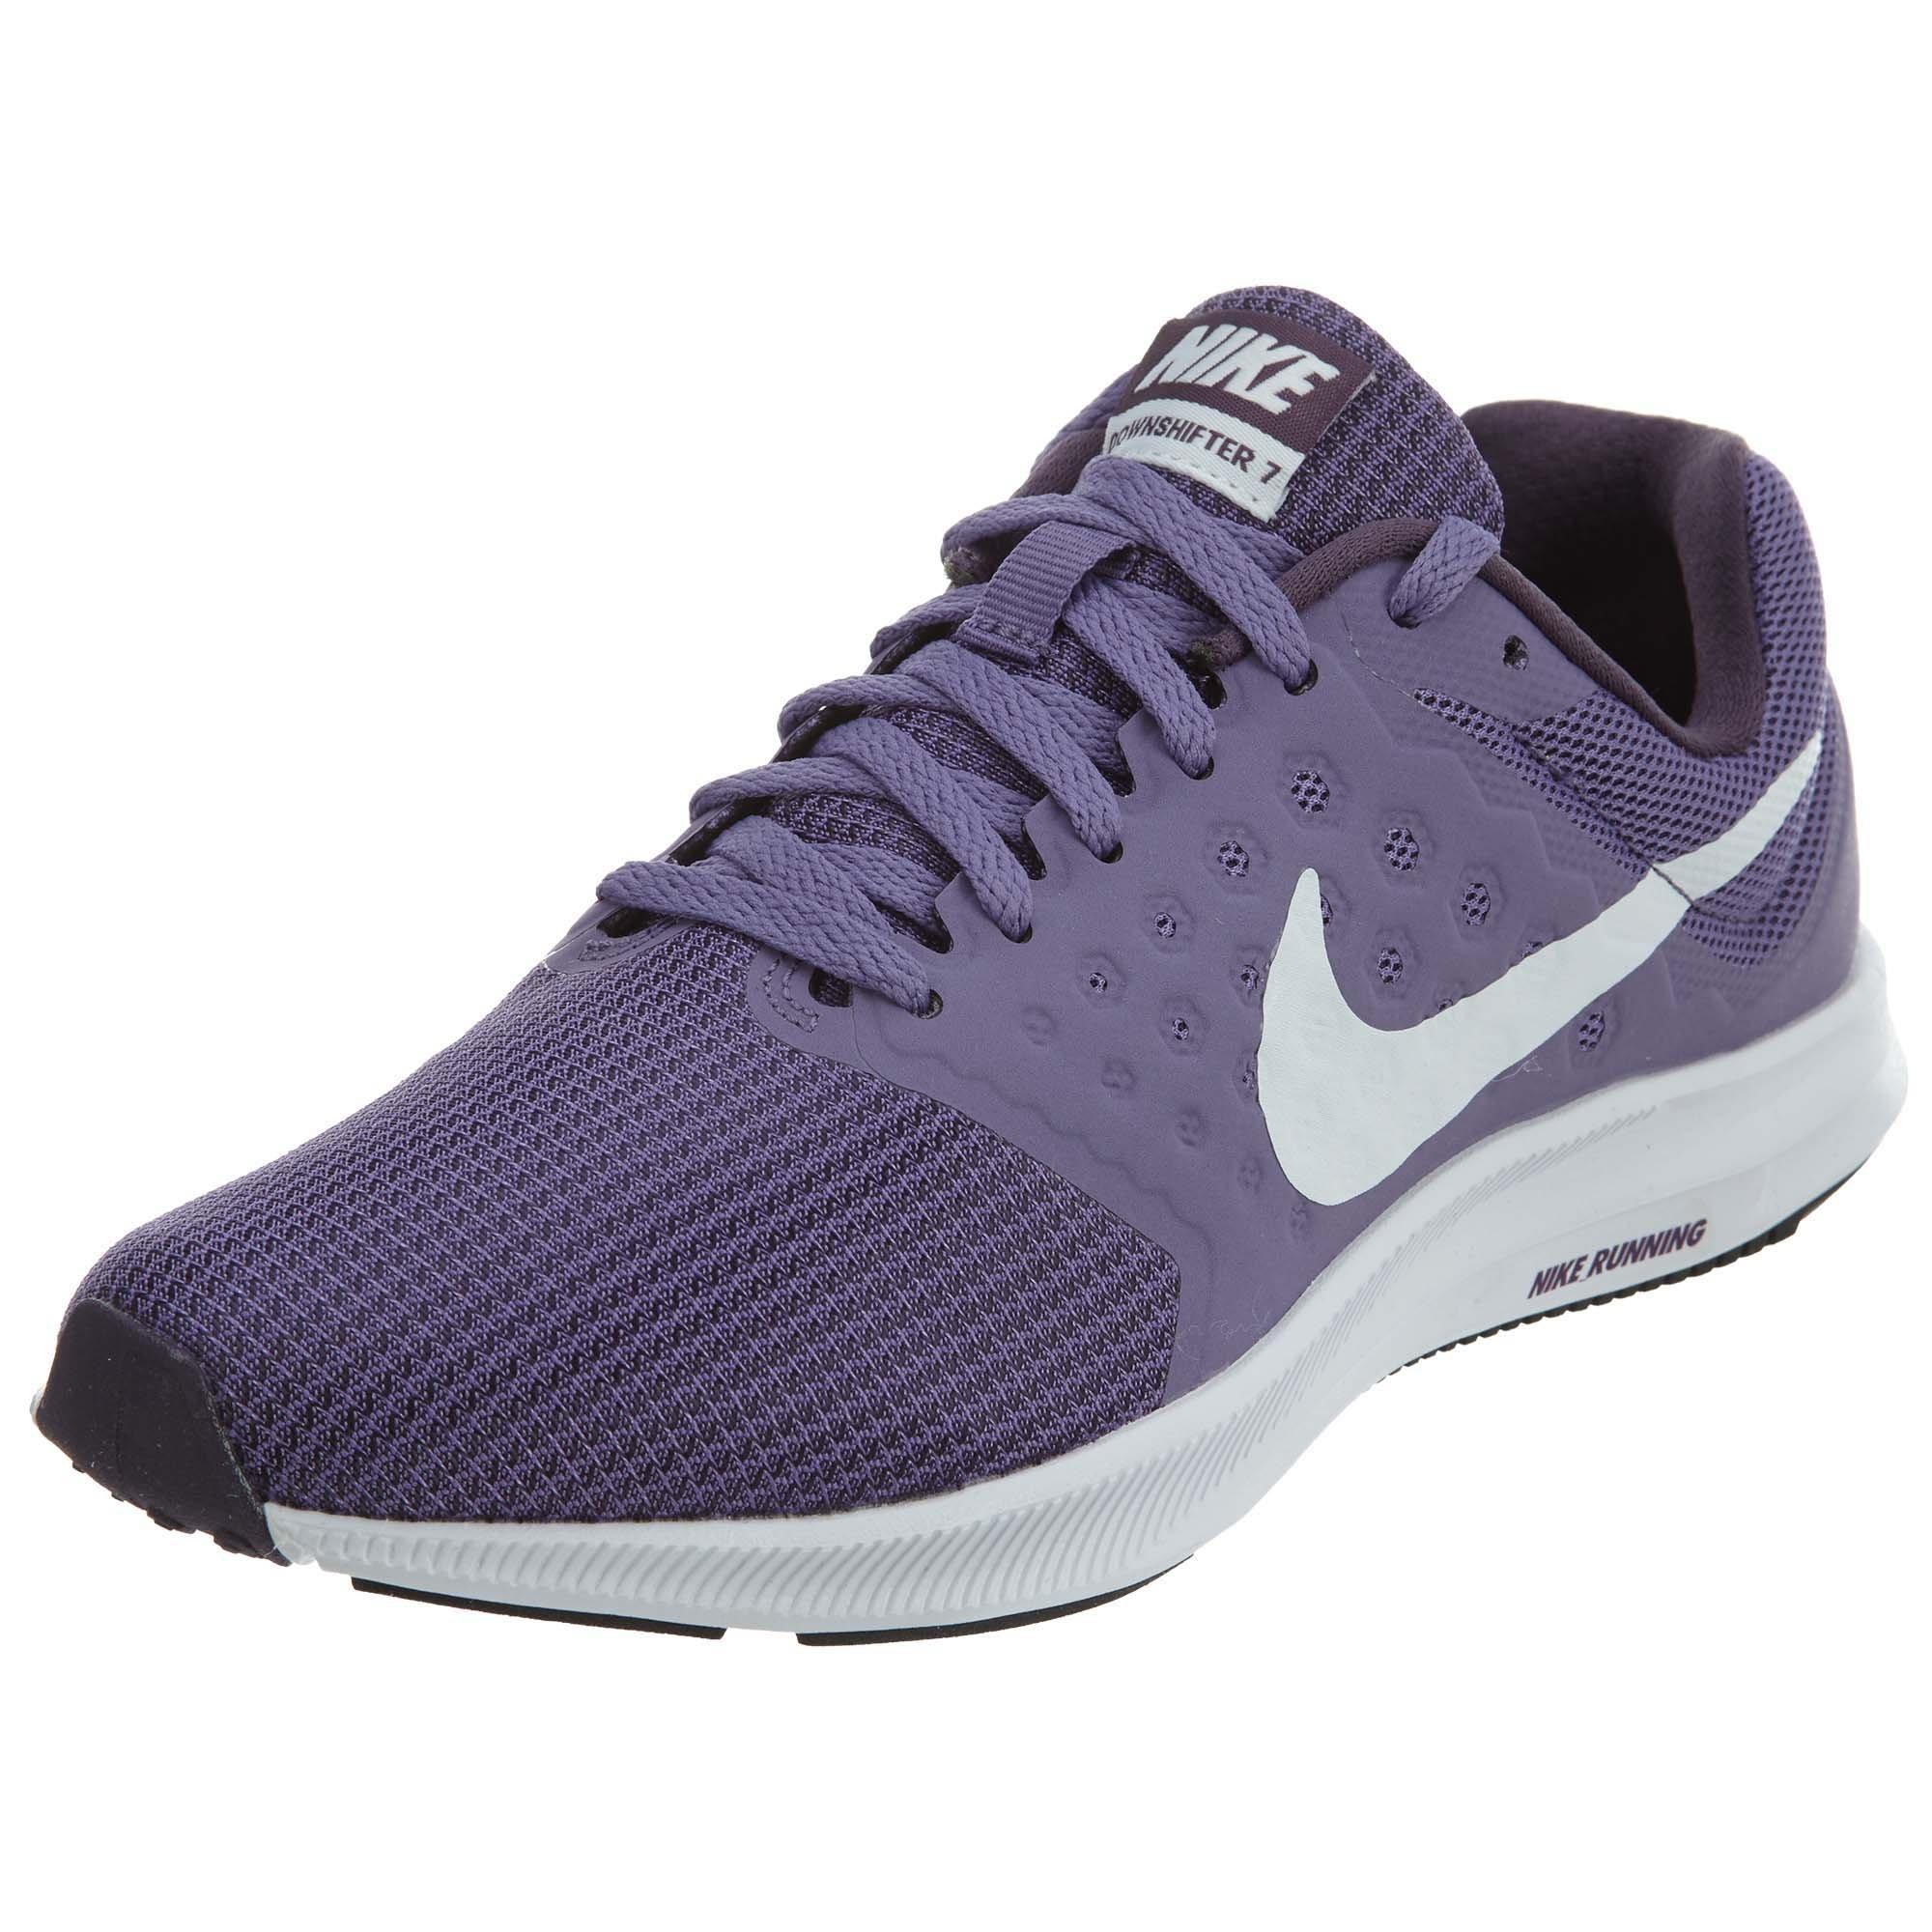 c18401f6c79d Galleon - Nike Women s Downshifter 7 Running Shoe Purple Earth White Dark  Raisin Black Size 9 M US